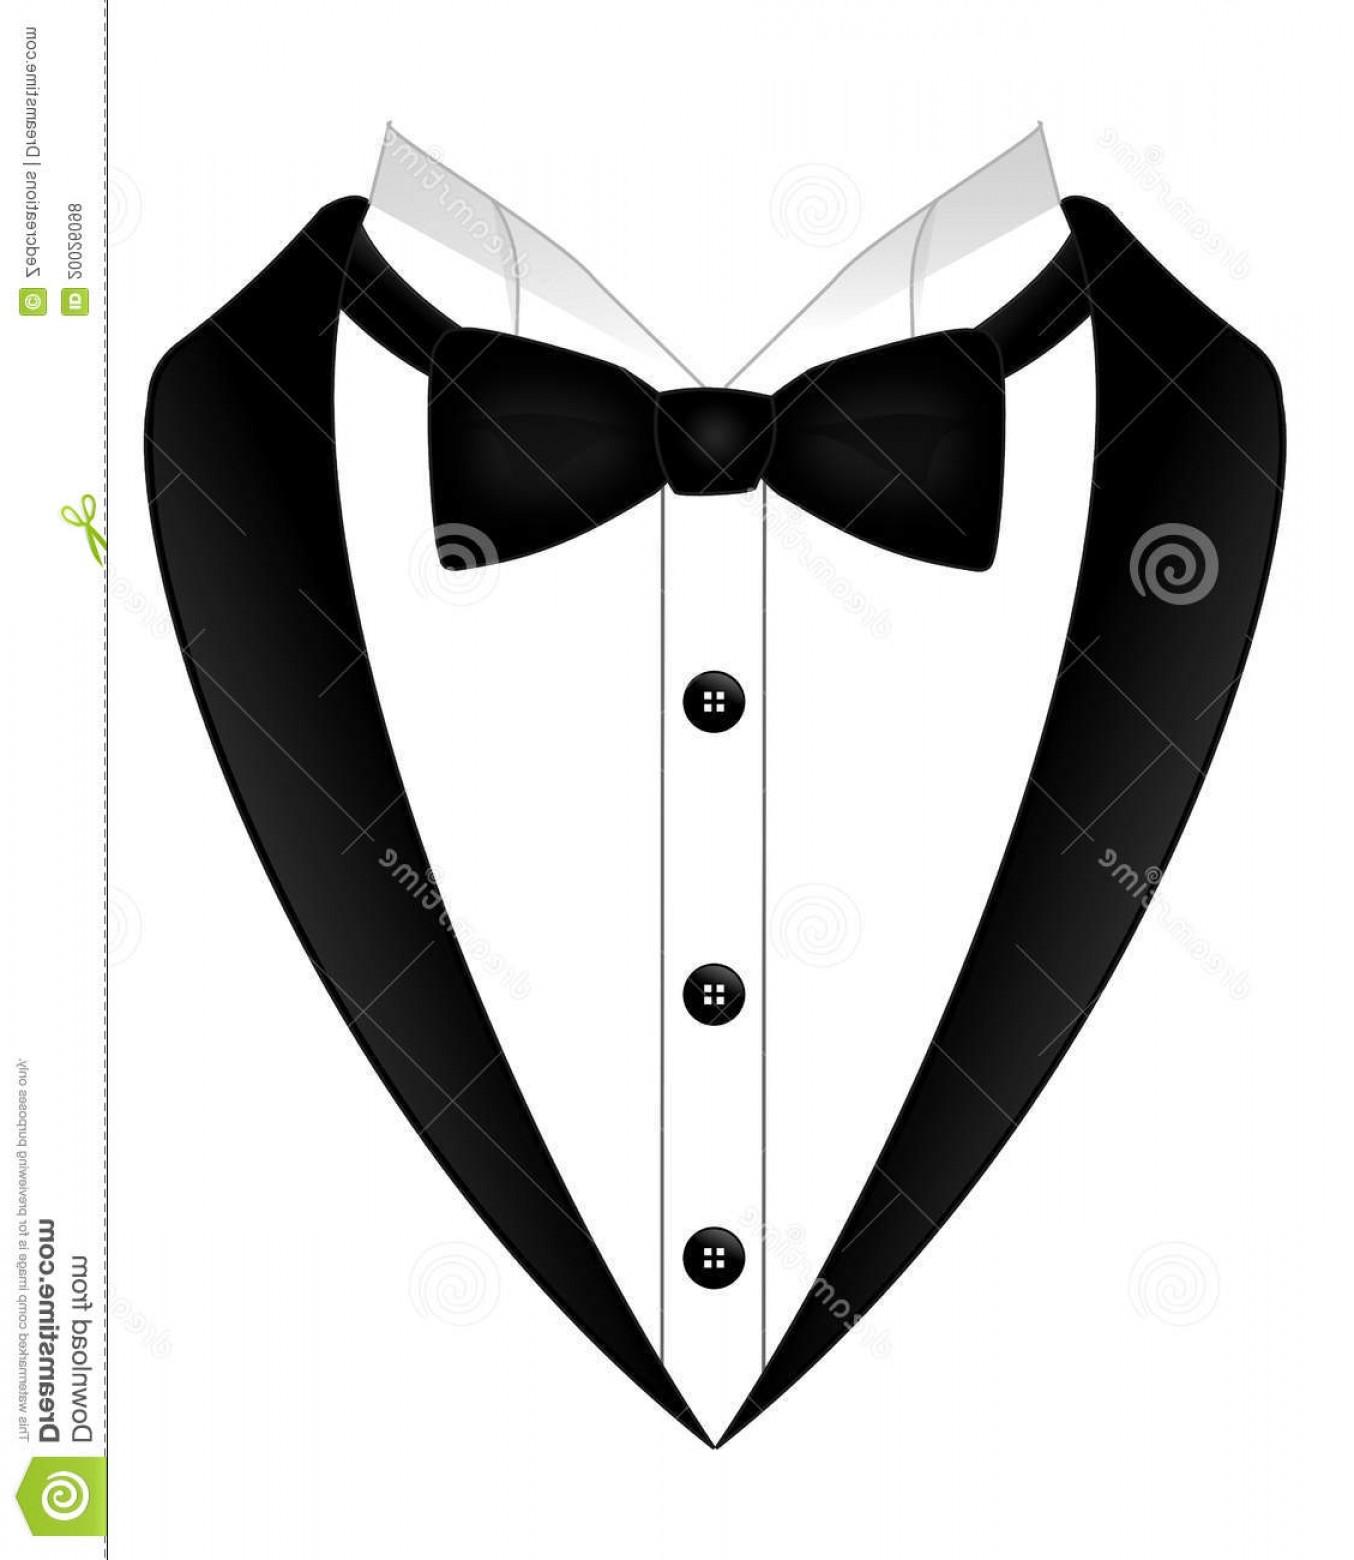 Top Tuxedo Bow Tie Clipart Graphic.